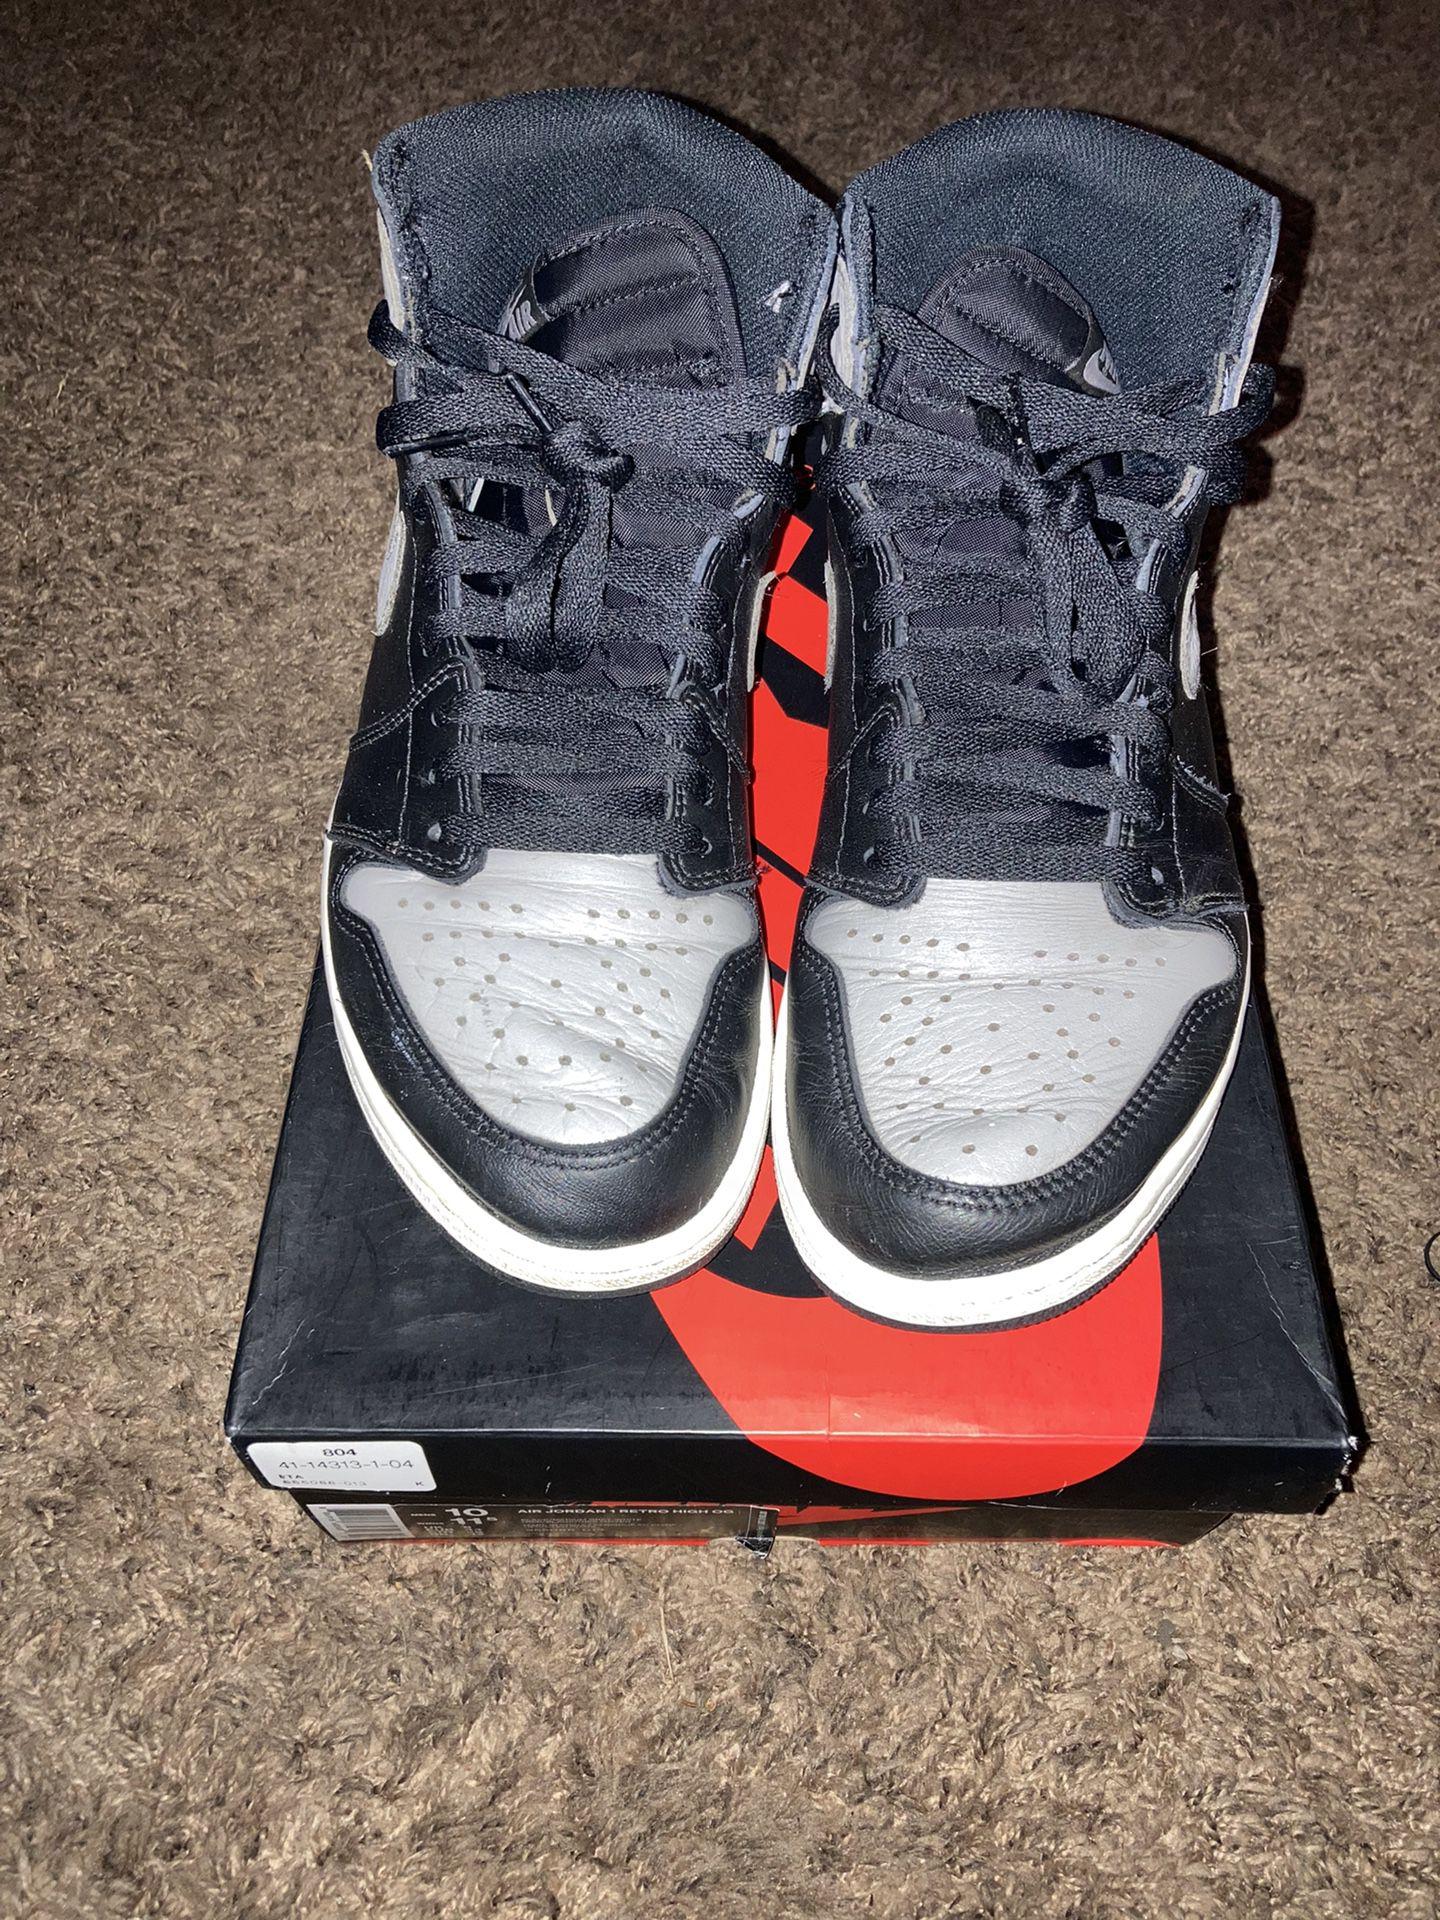 Jordan 1 Shadow  Size 10